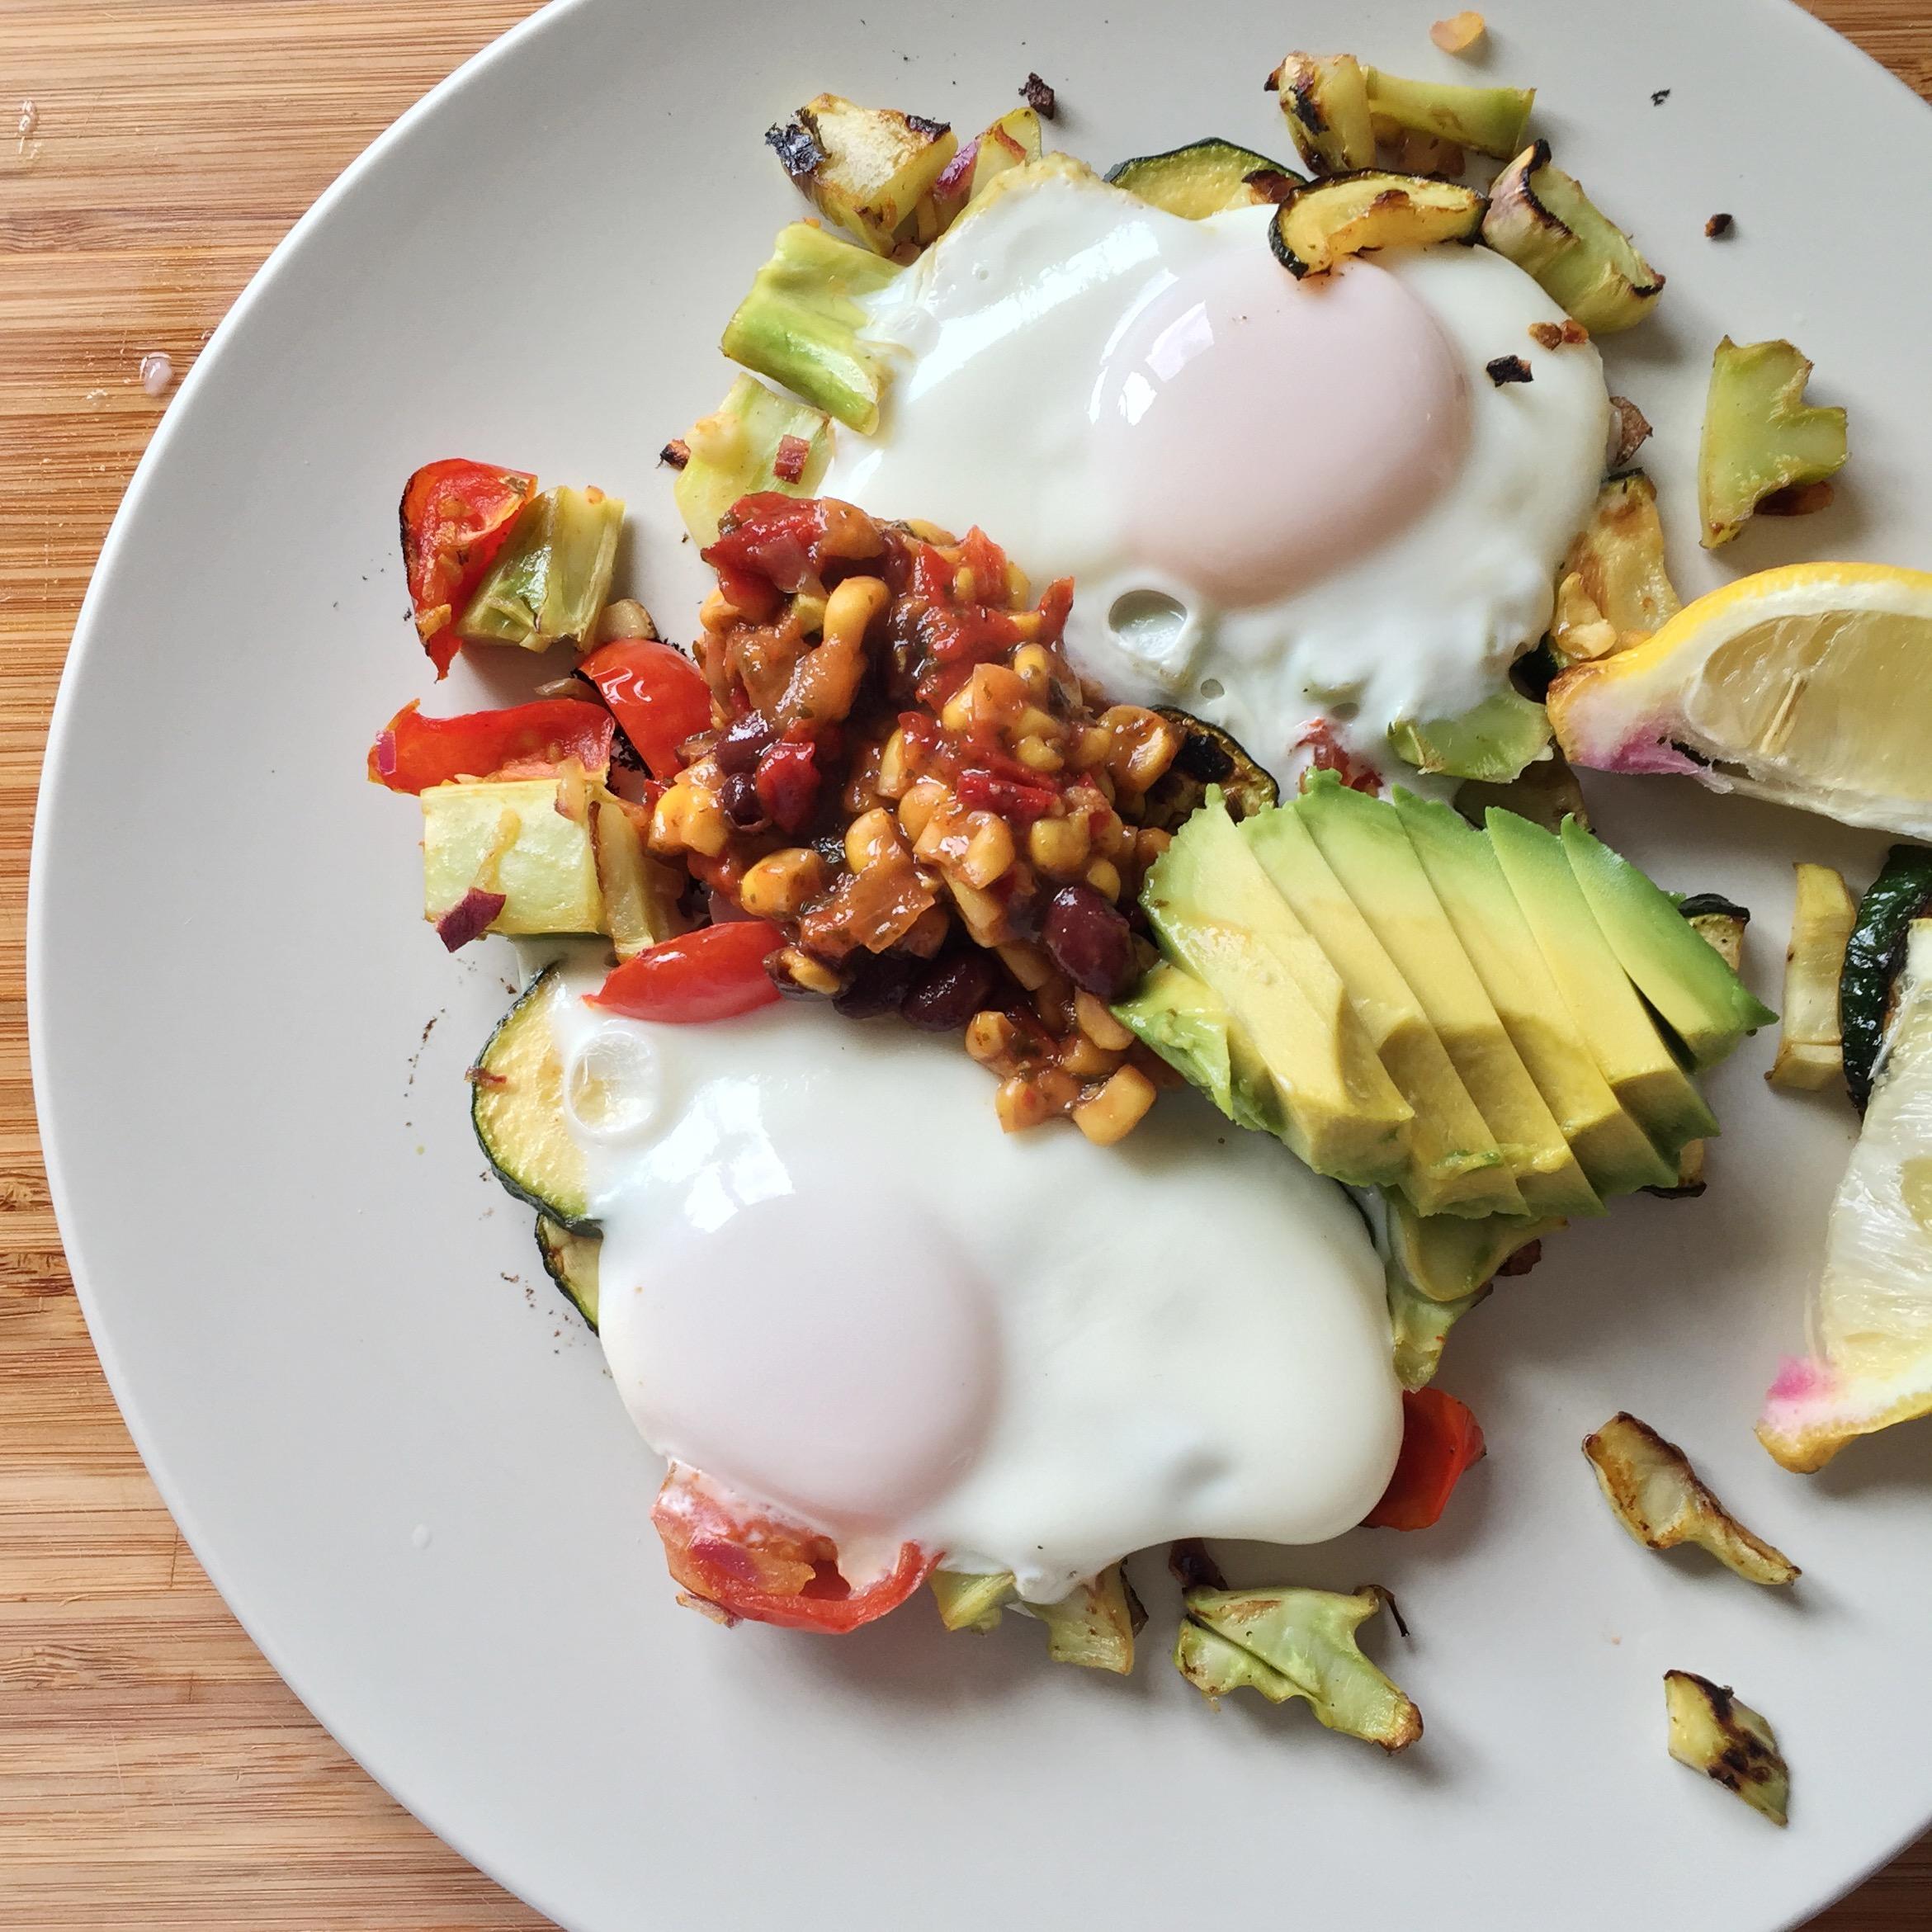 Breakfast scramble using my tomatoes, broccoli stems, zucchini, & avocado, and some local eggs